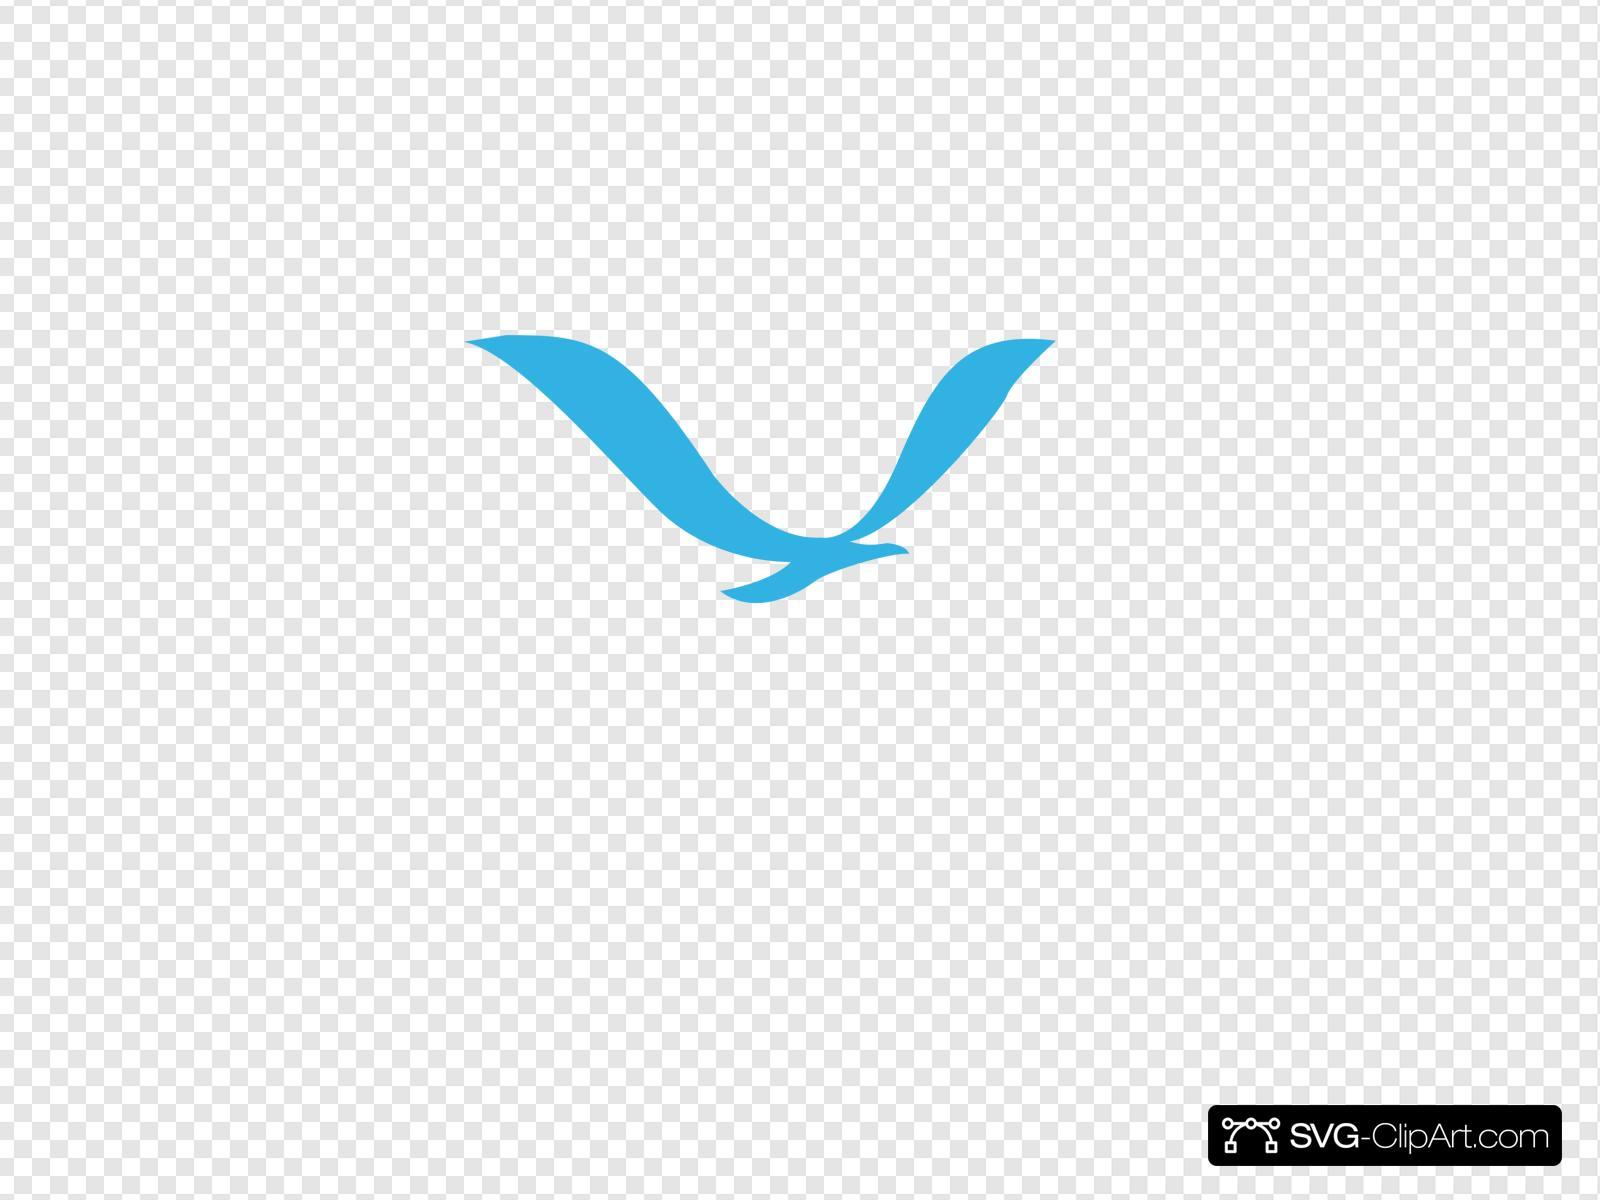 Noaa Bird Clip art, Icon and SVG.